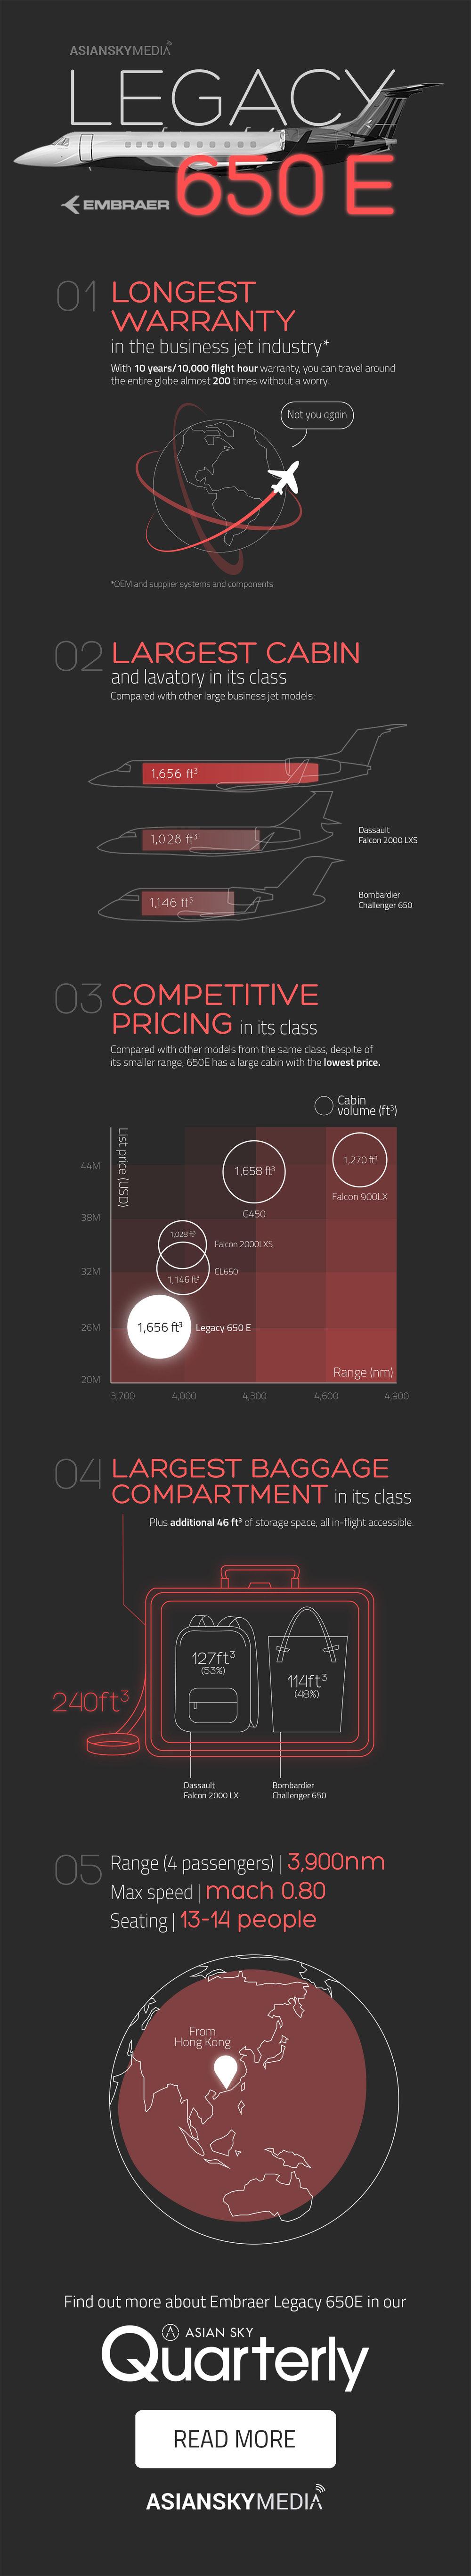 AsianSkyMedia-Legacy650E-Infographic